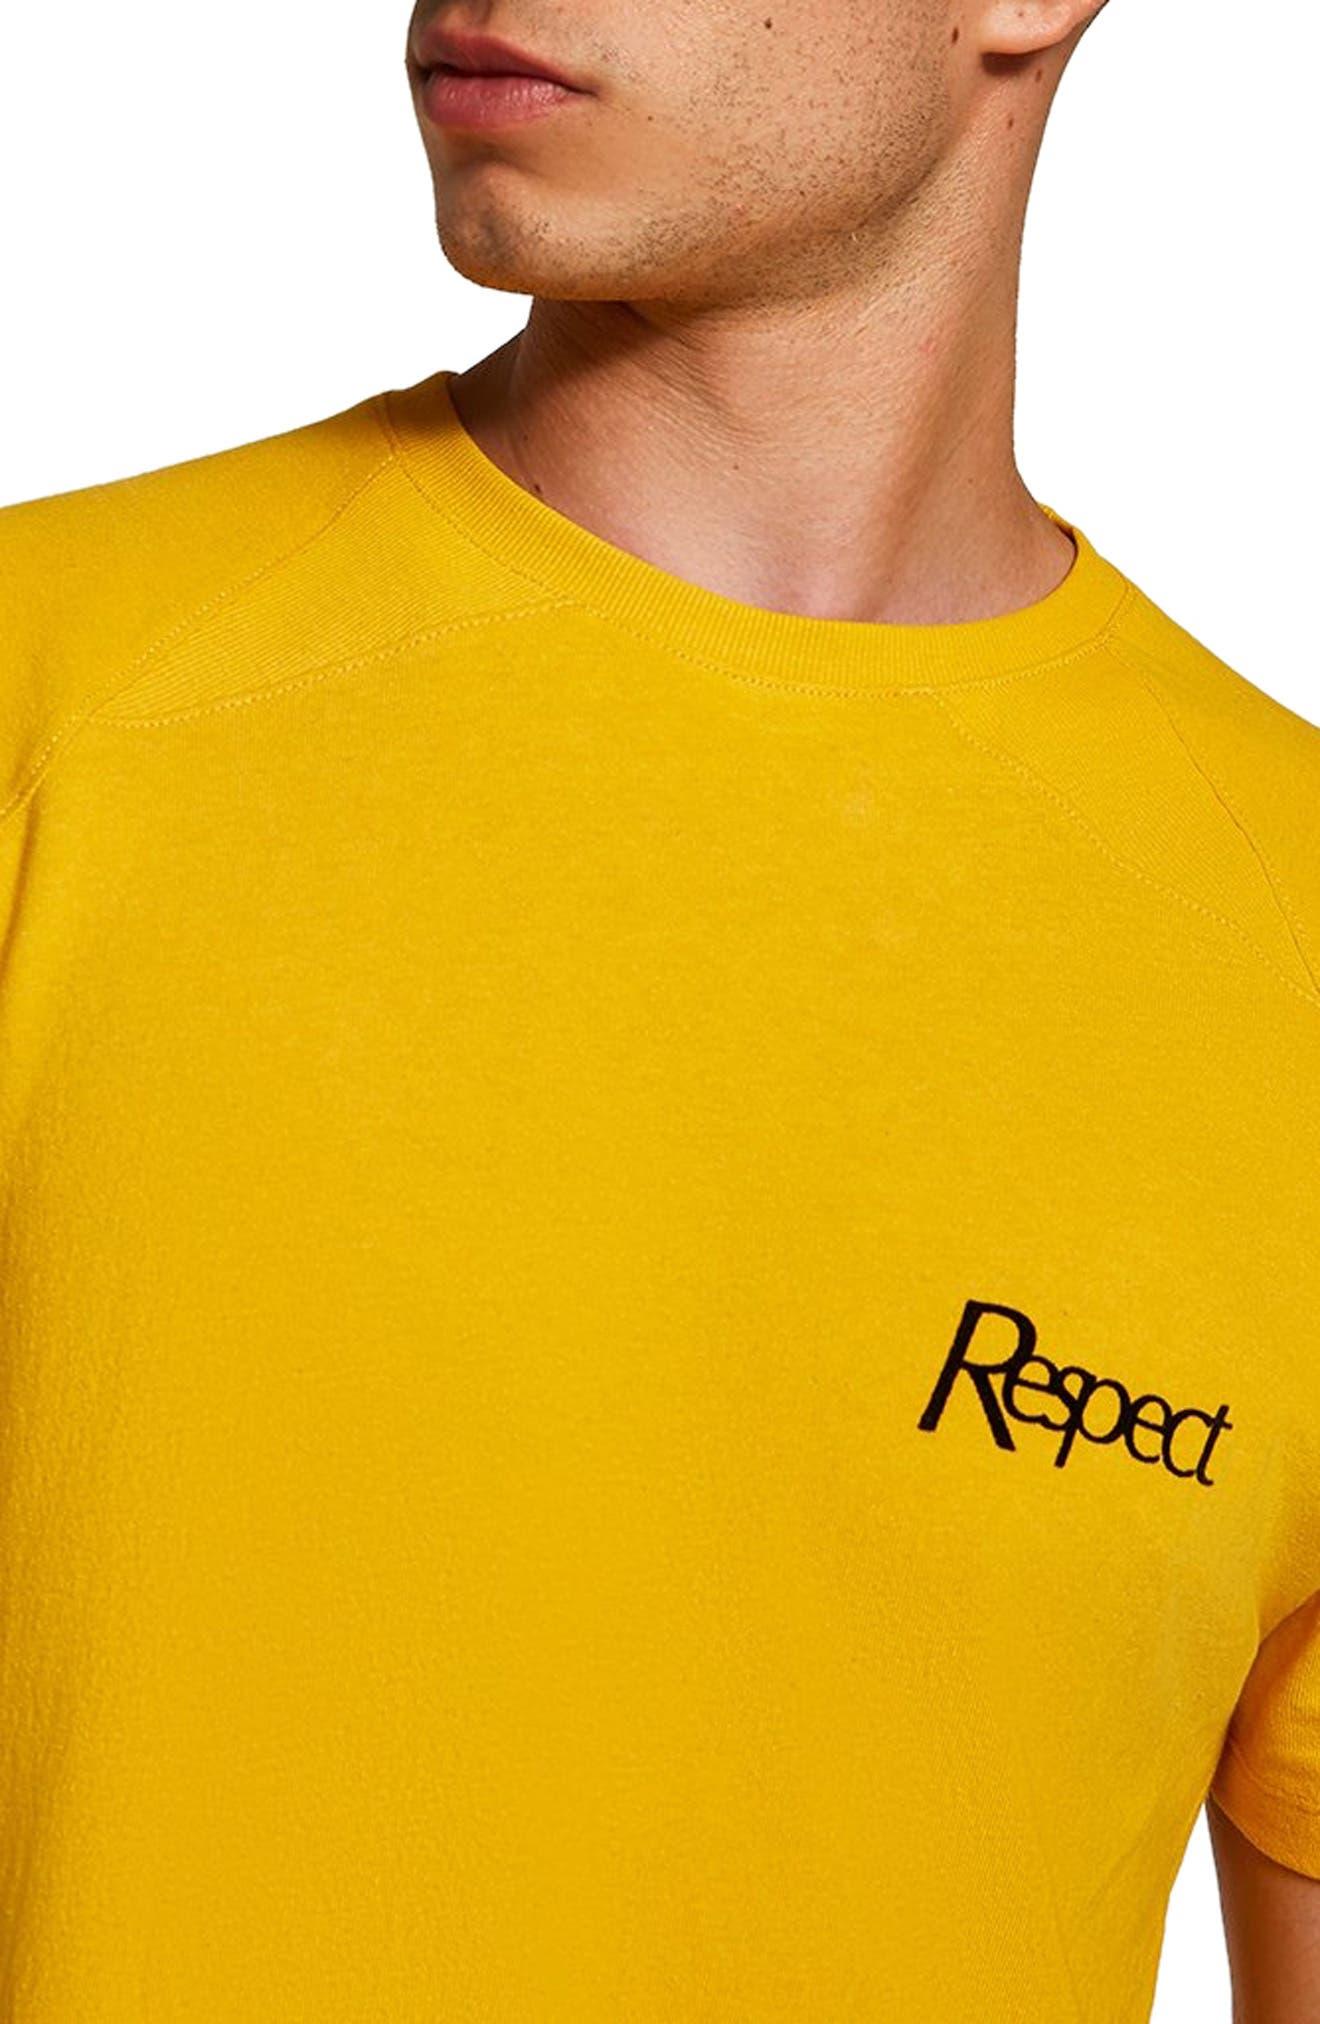 Respect Classic Fit T-Shirt,                             Alternate thumbnail 3, color,                             710